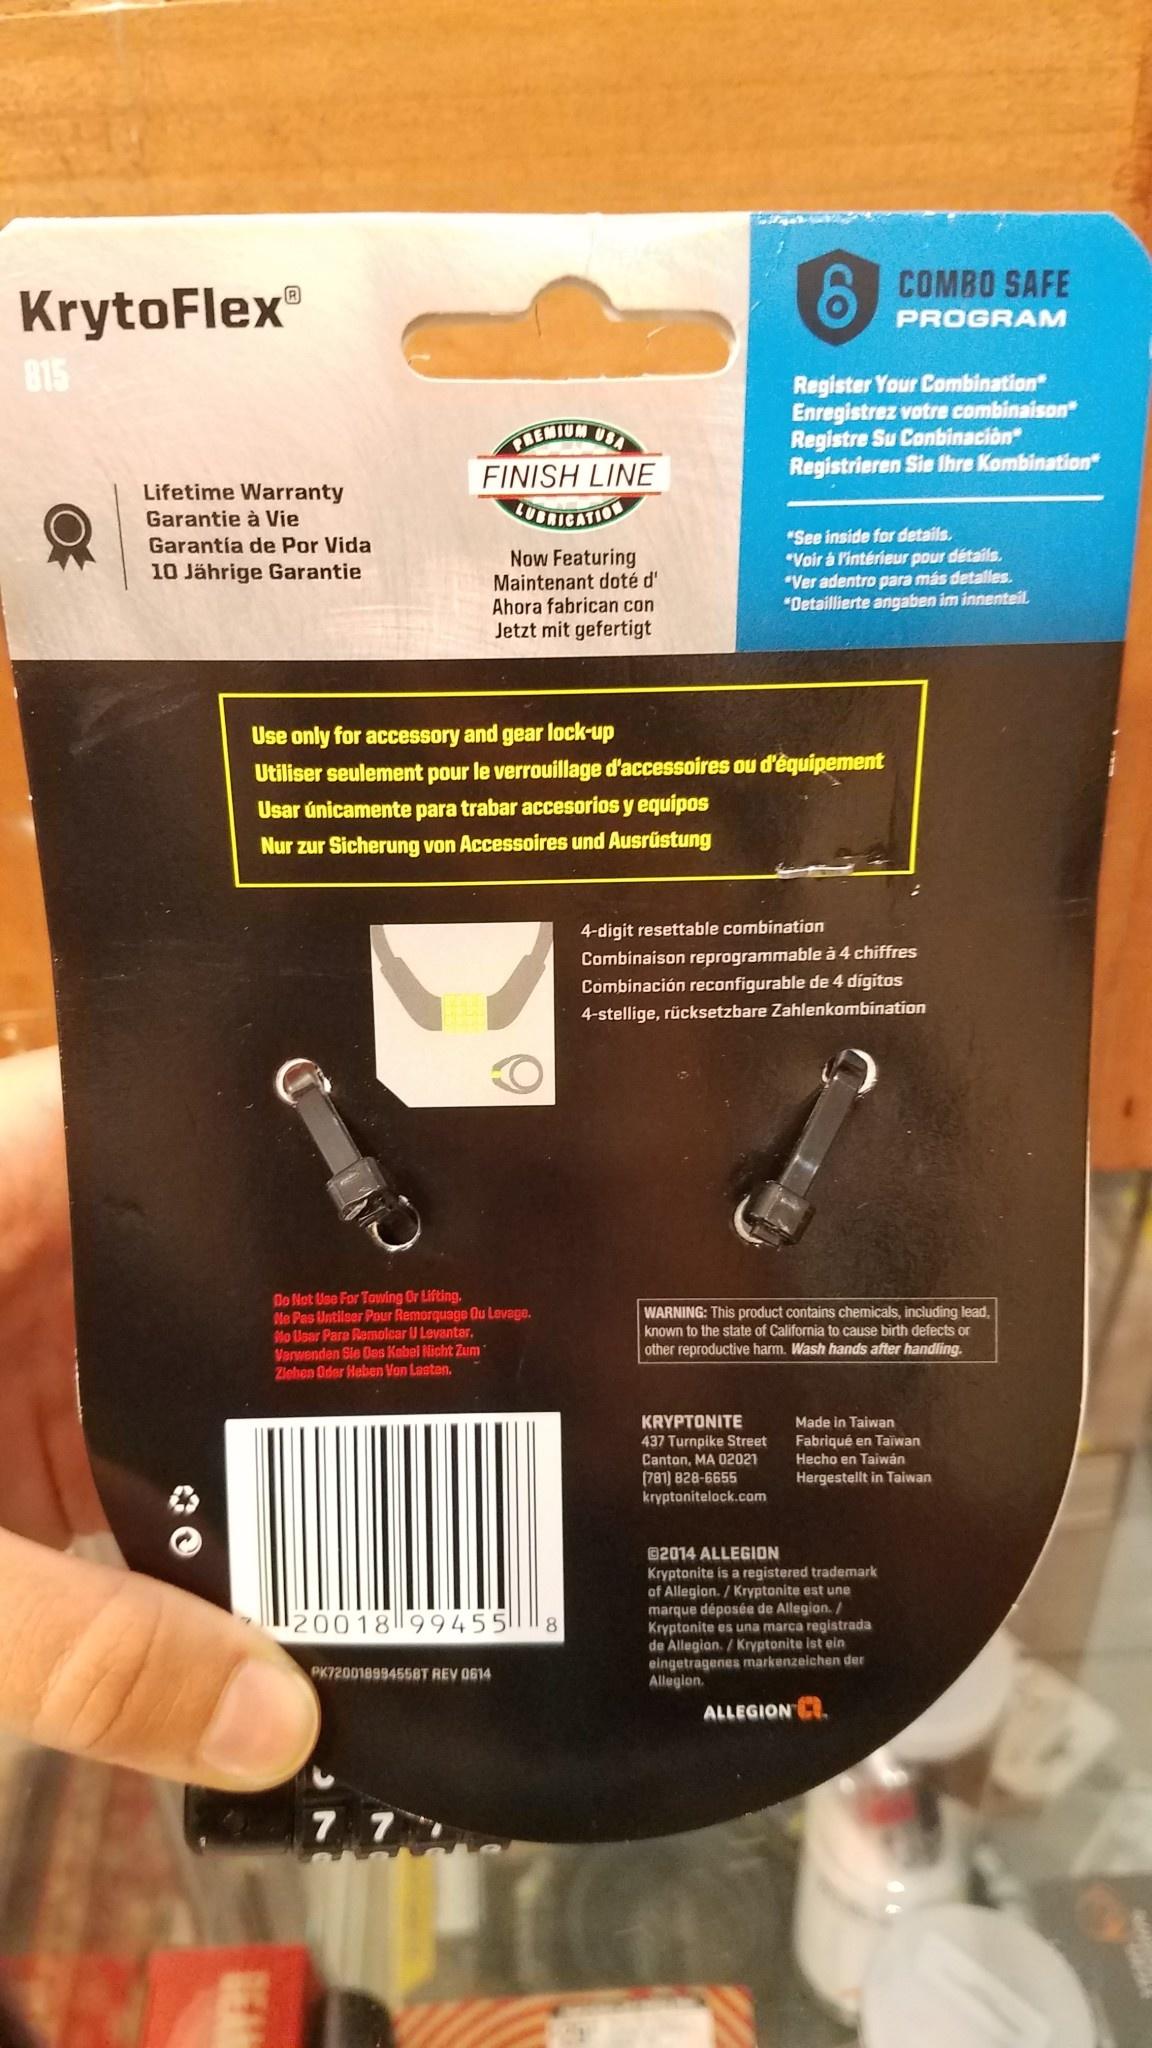 Kryptonite KryptoFlex 815 Combo Cable lock